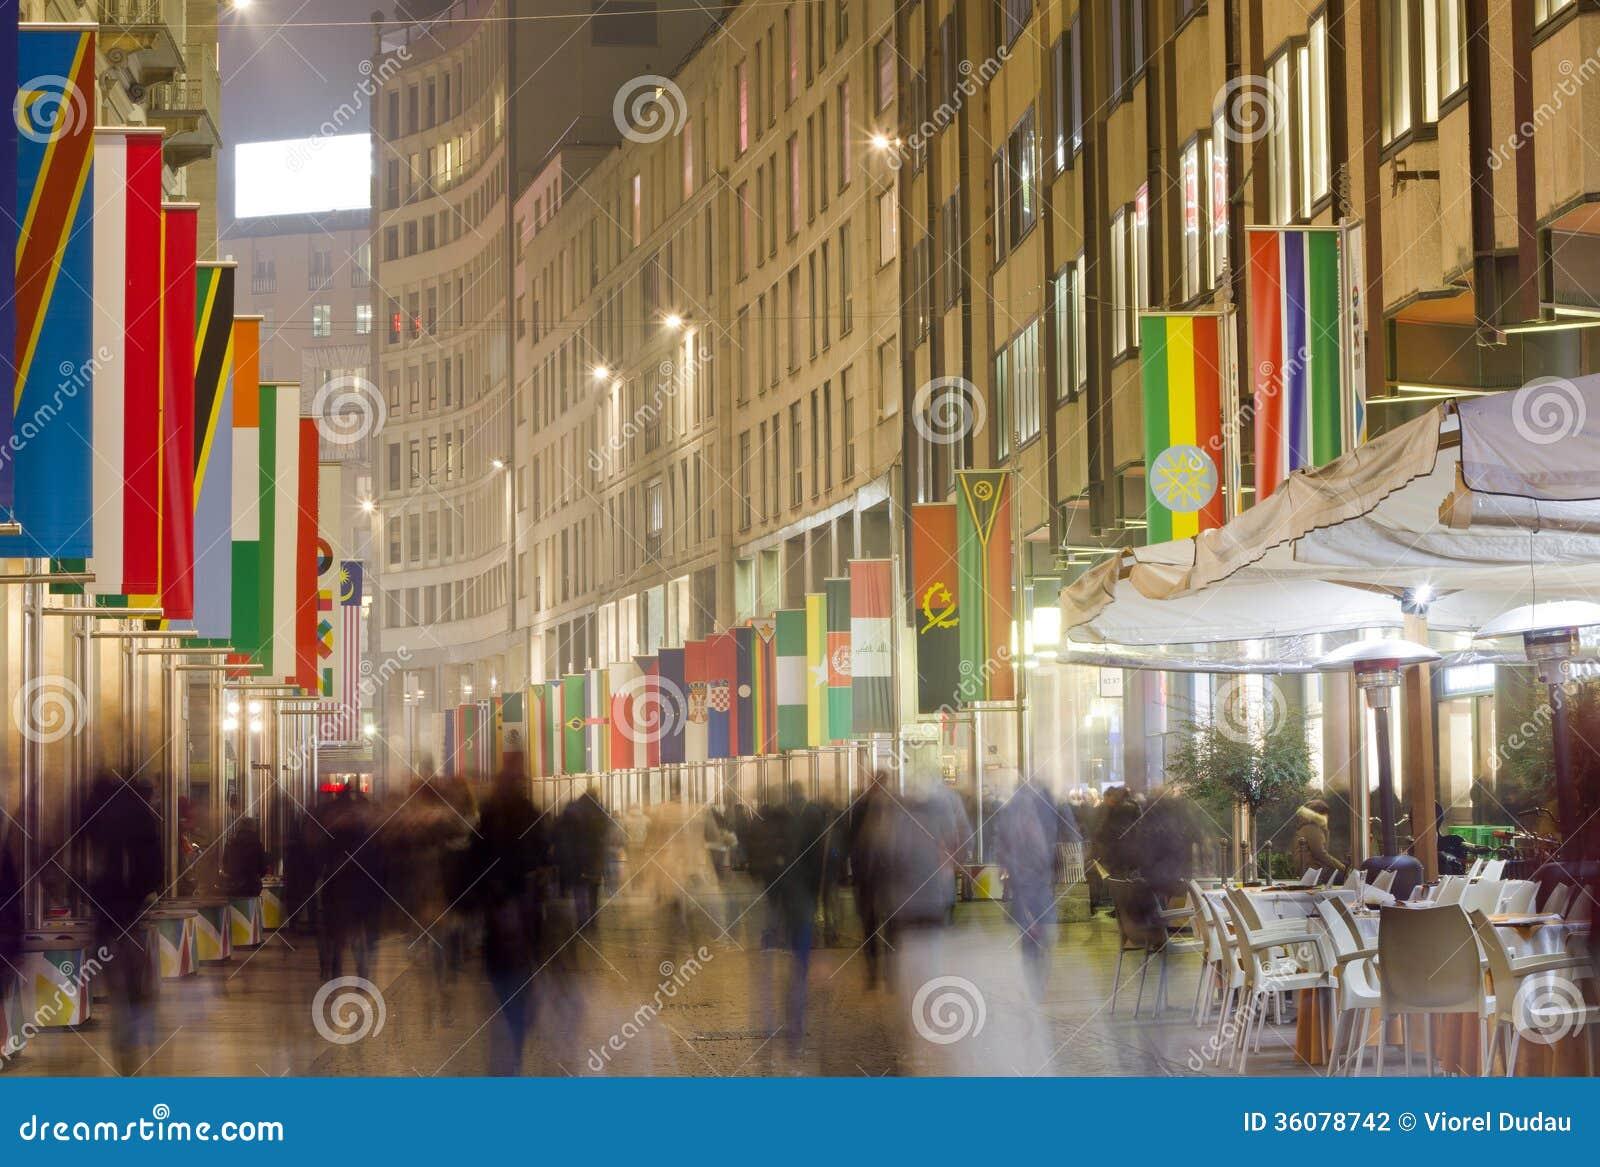 Corso Vittorio Emanuele in Milan